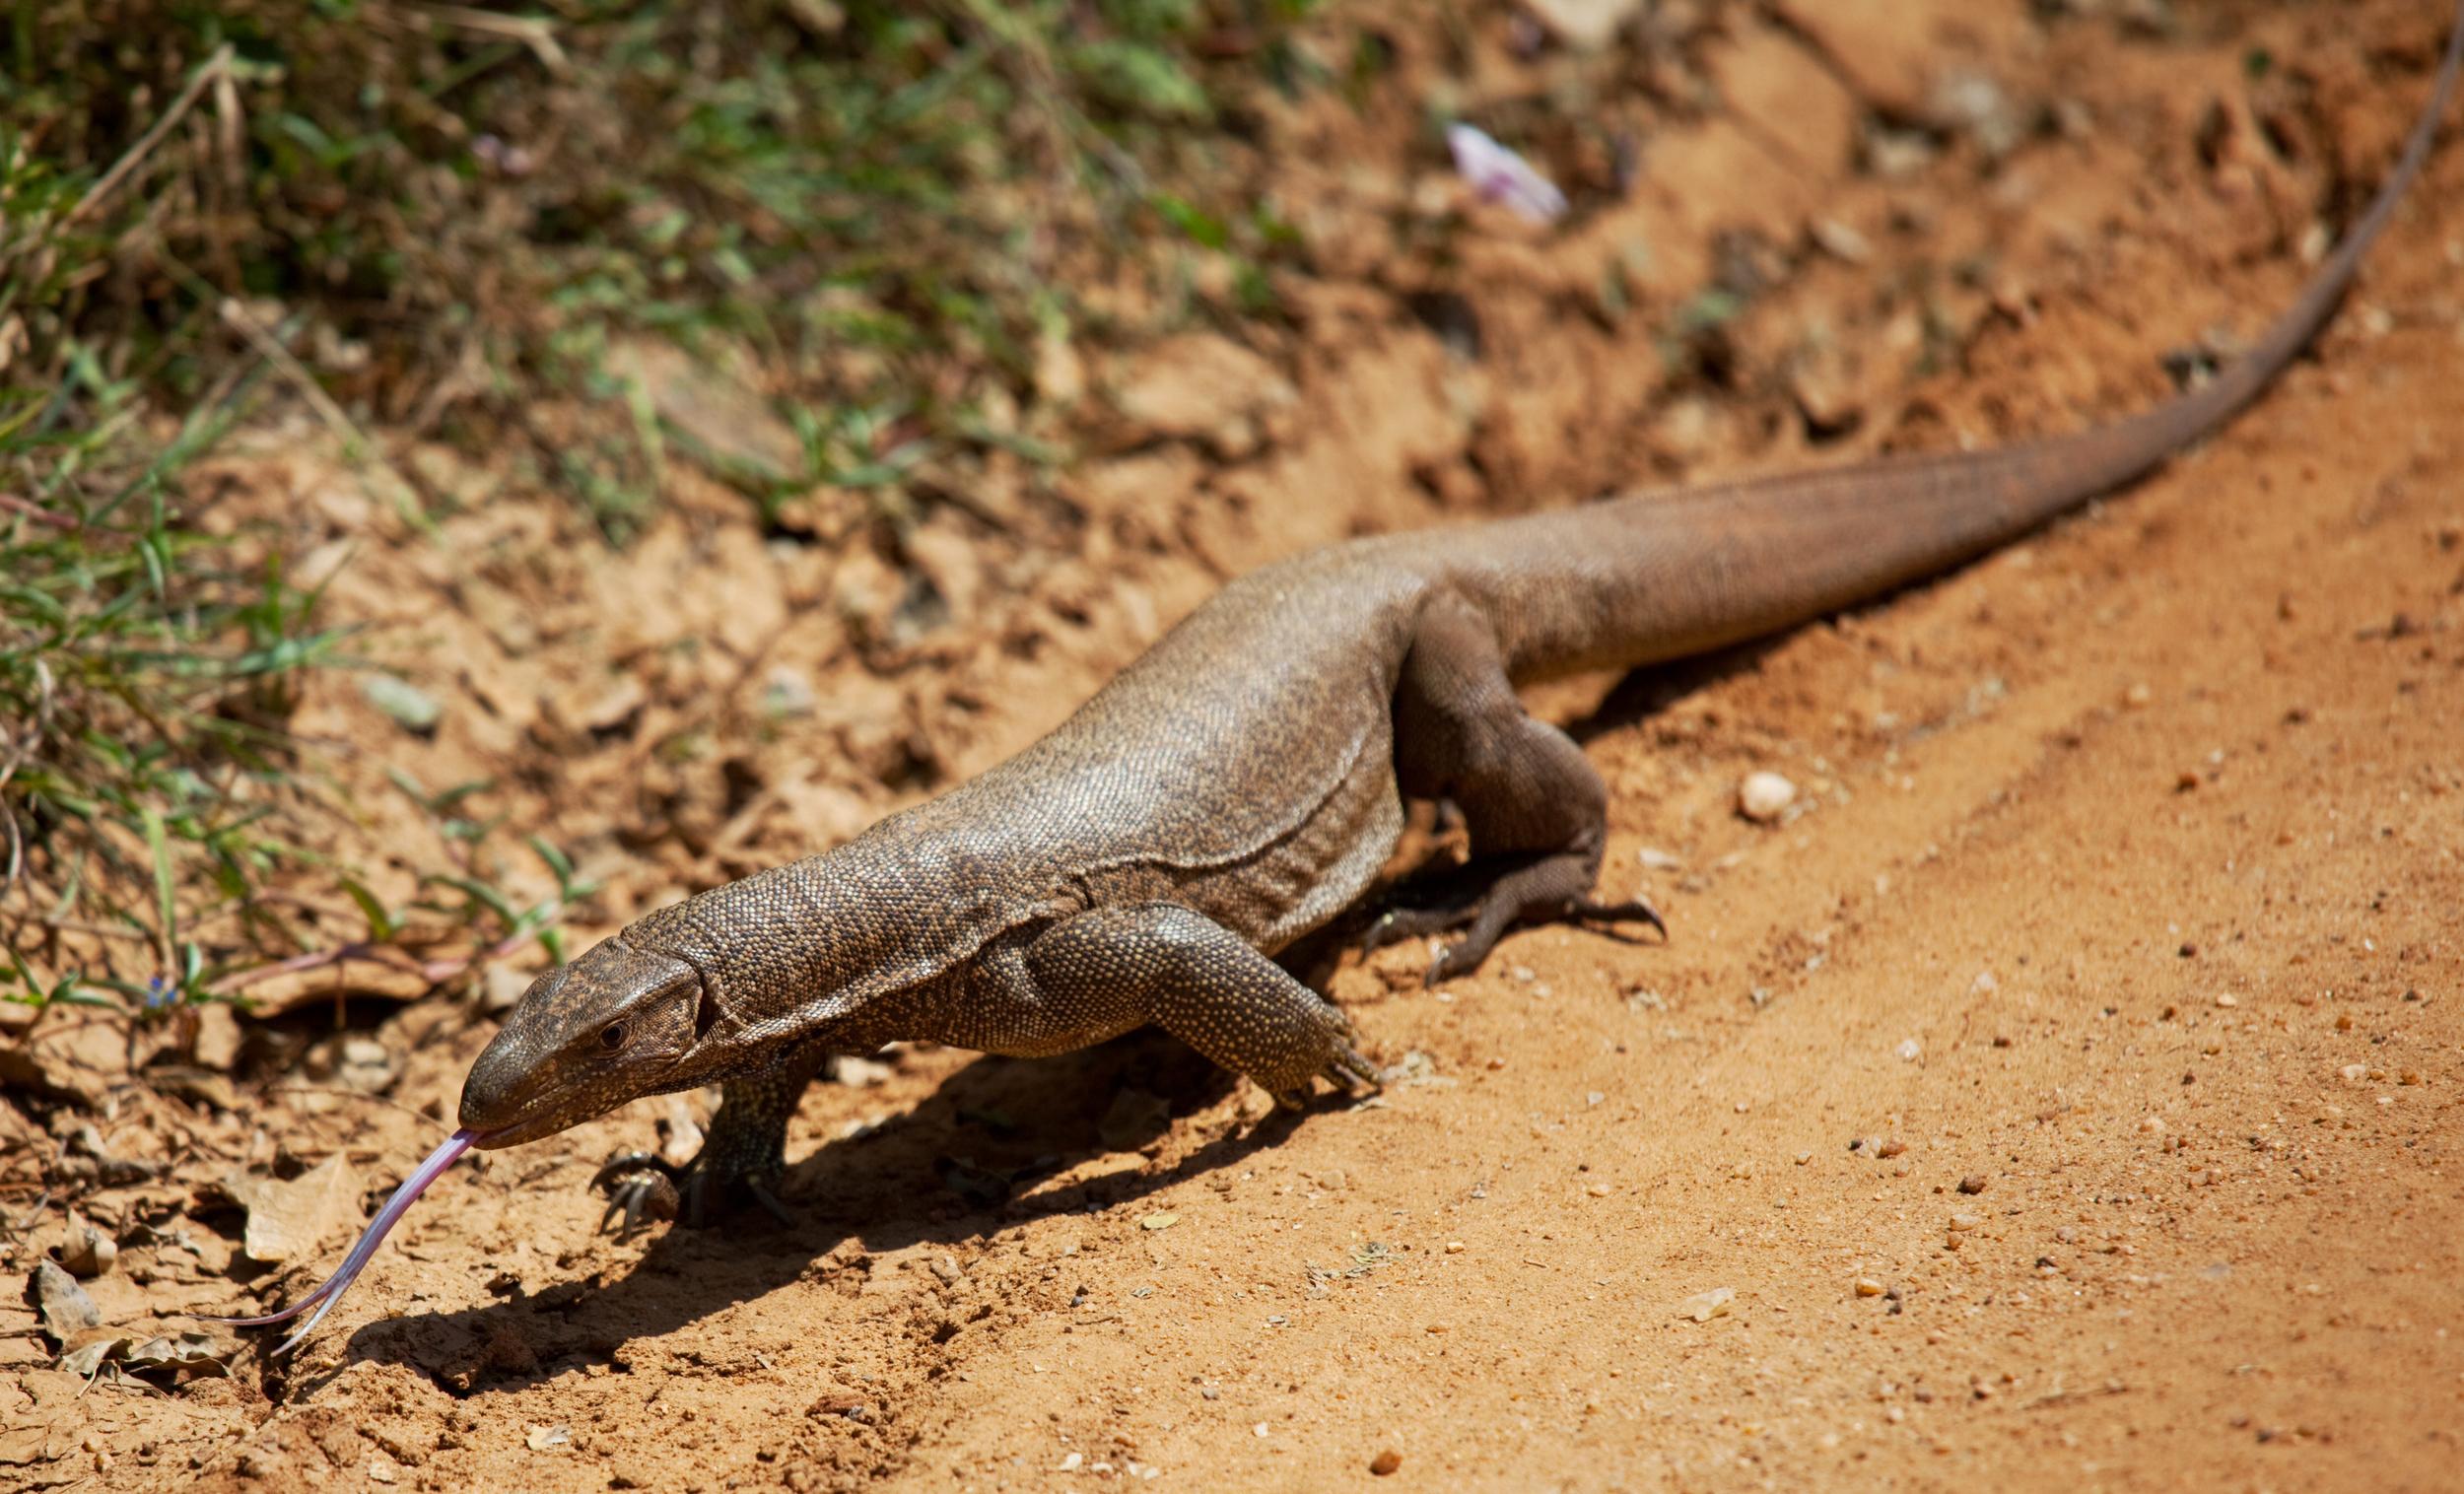 invite-to-paradise-sri-lanka-honeymoon-holiday-wildlife-safari-water-monitor.jpg